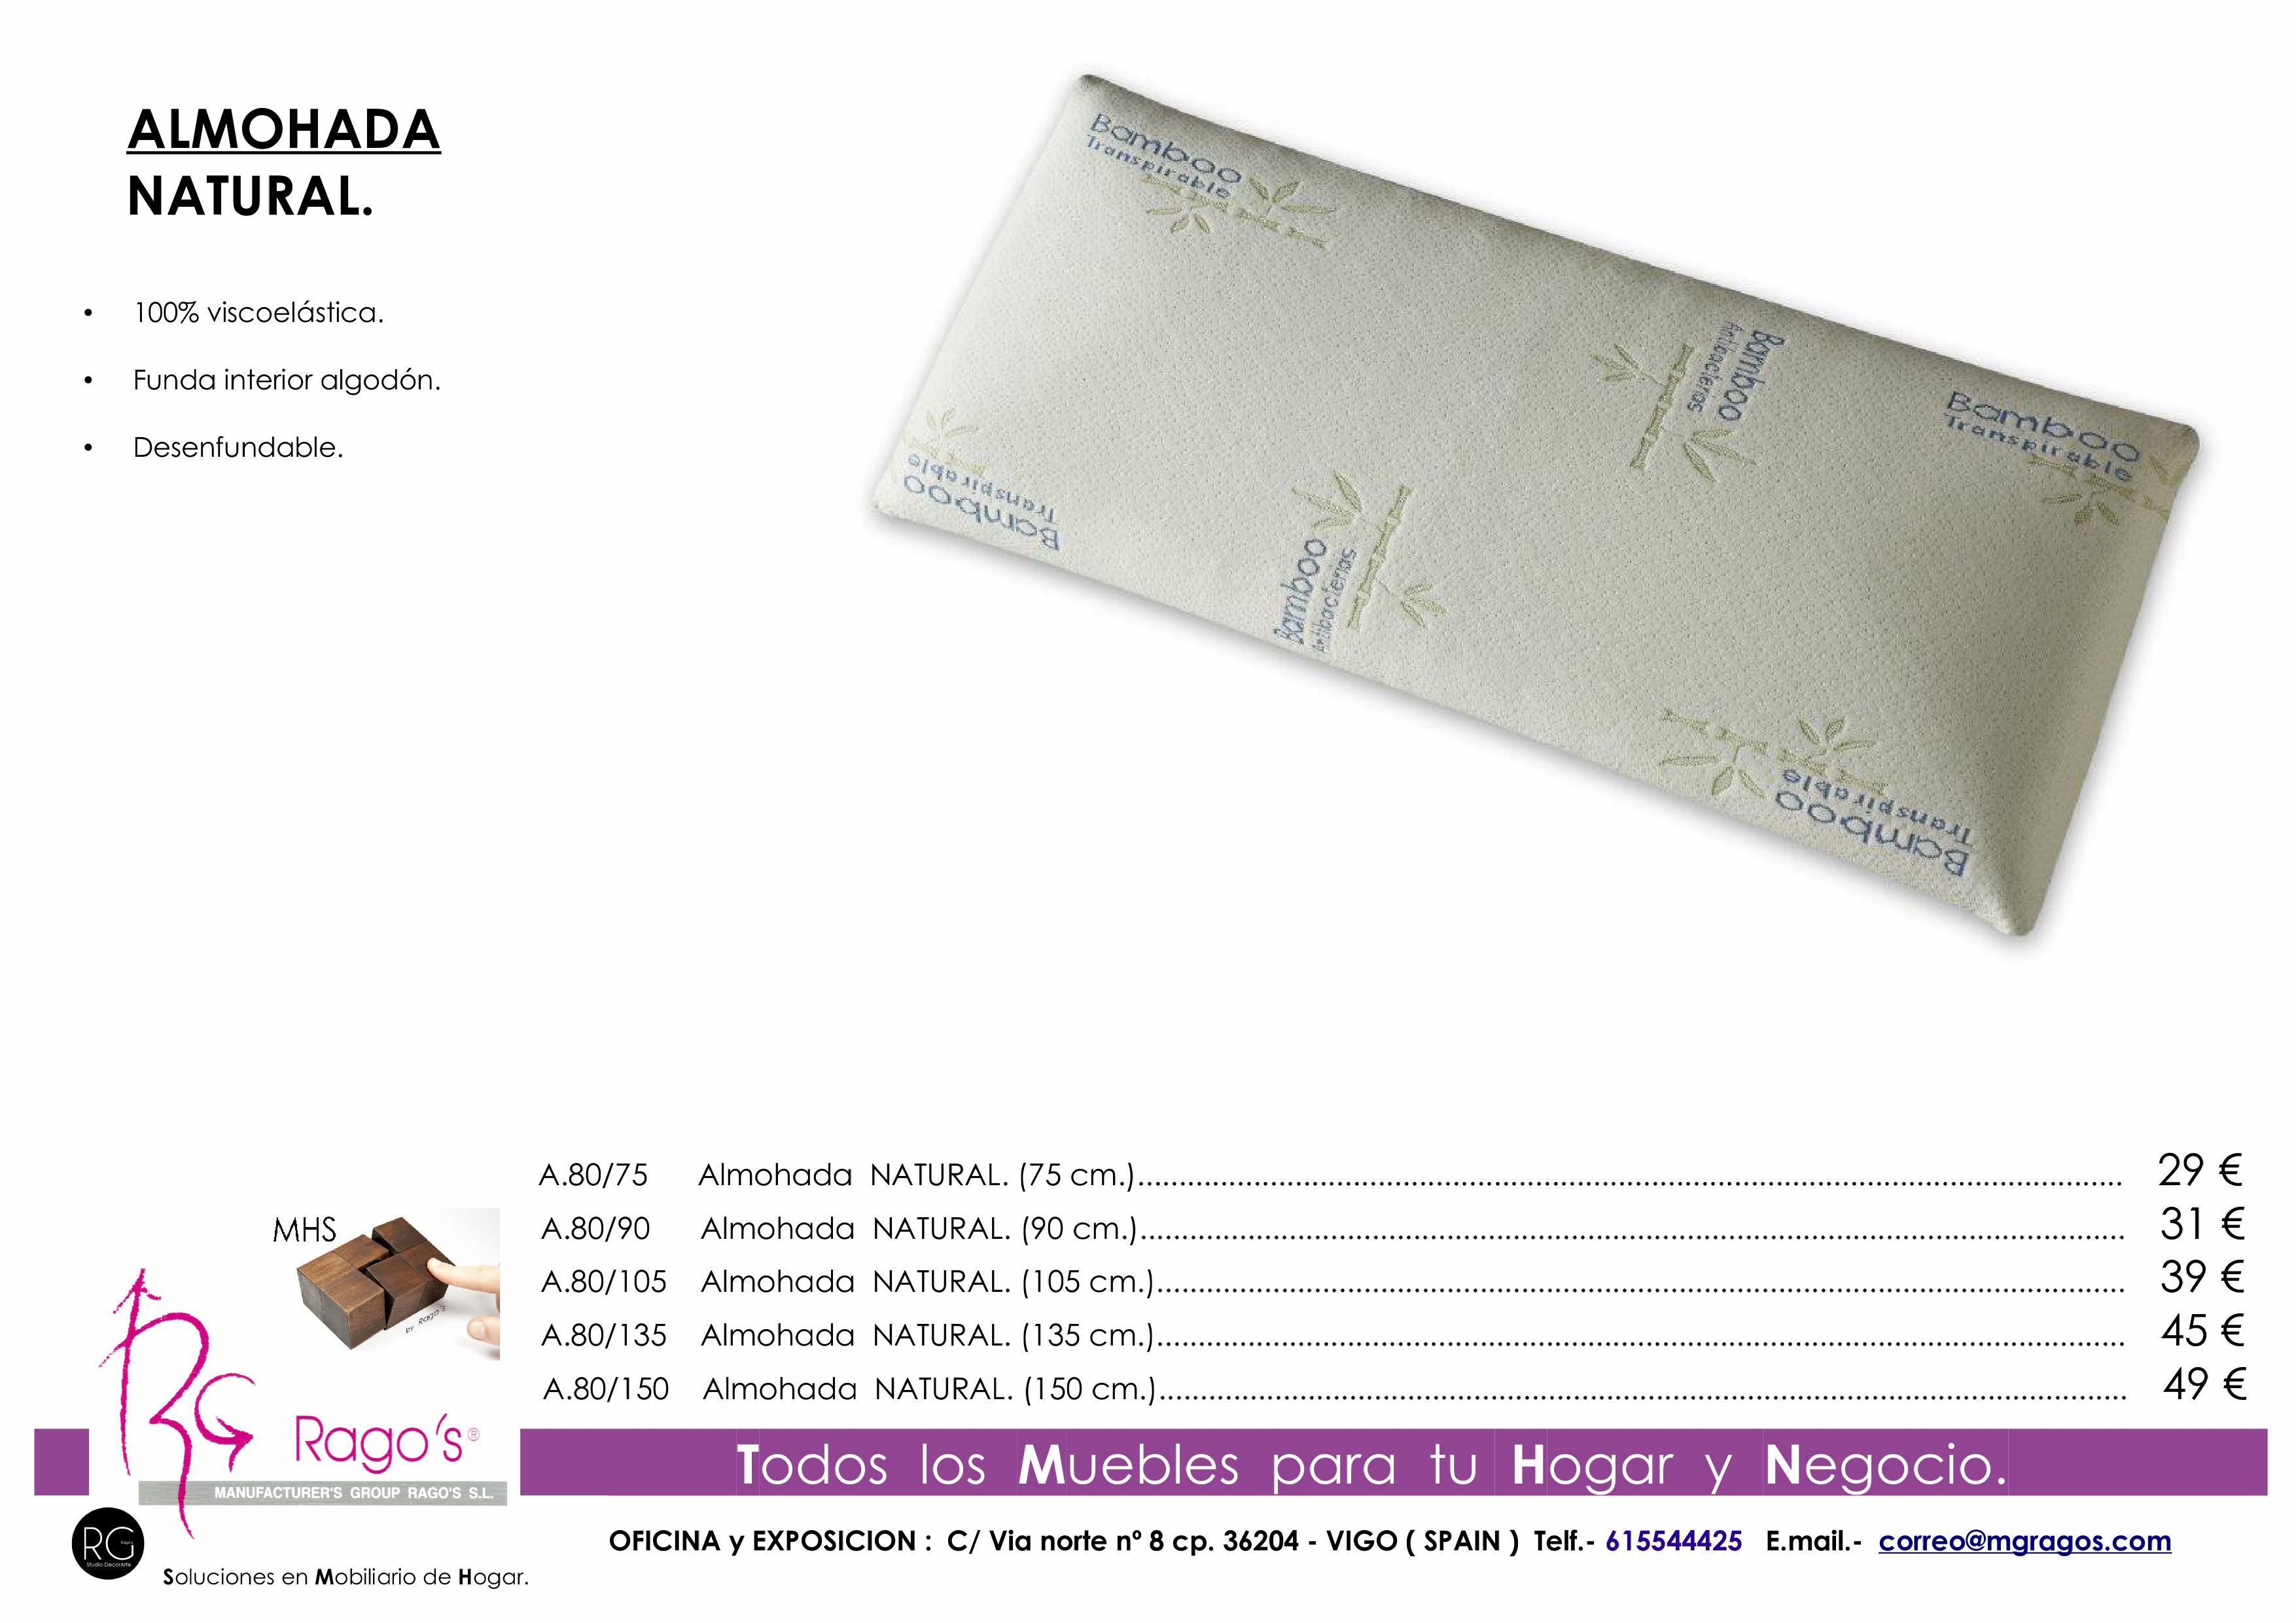 A.80 Almohada NATURAL Pag. nº 9